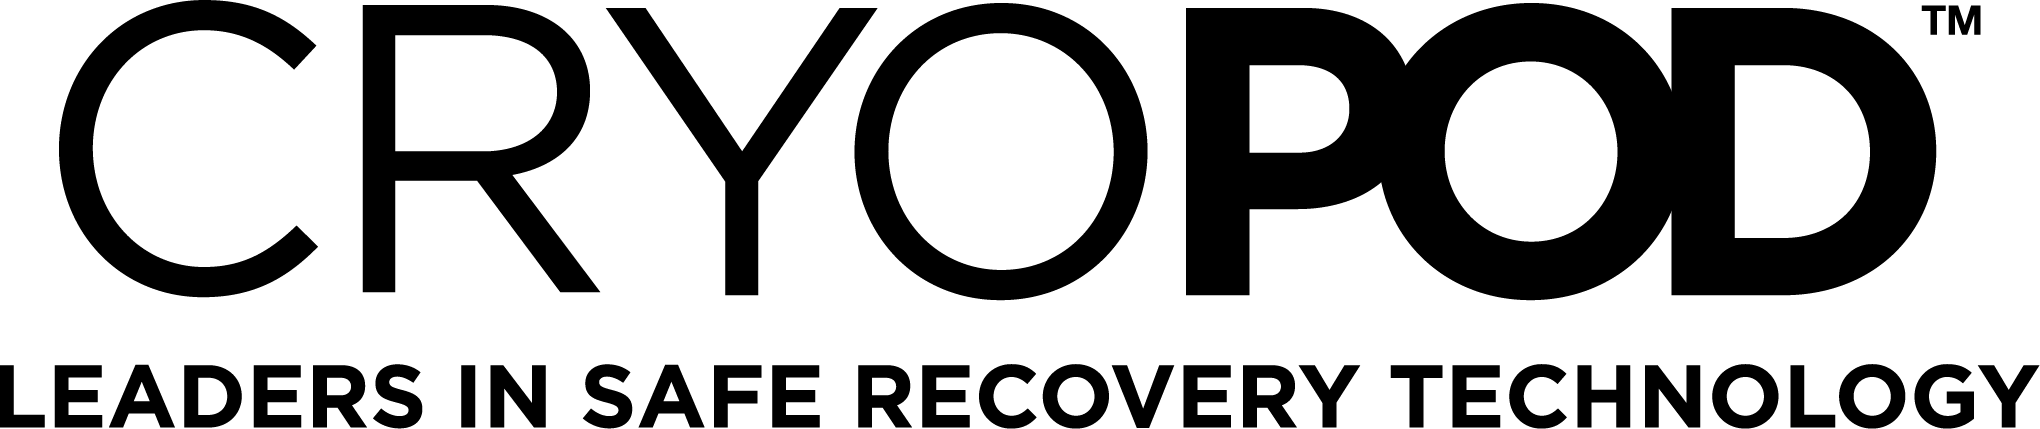 CRYOPOD